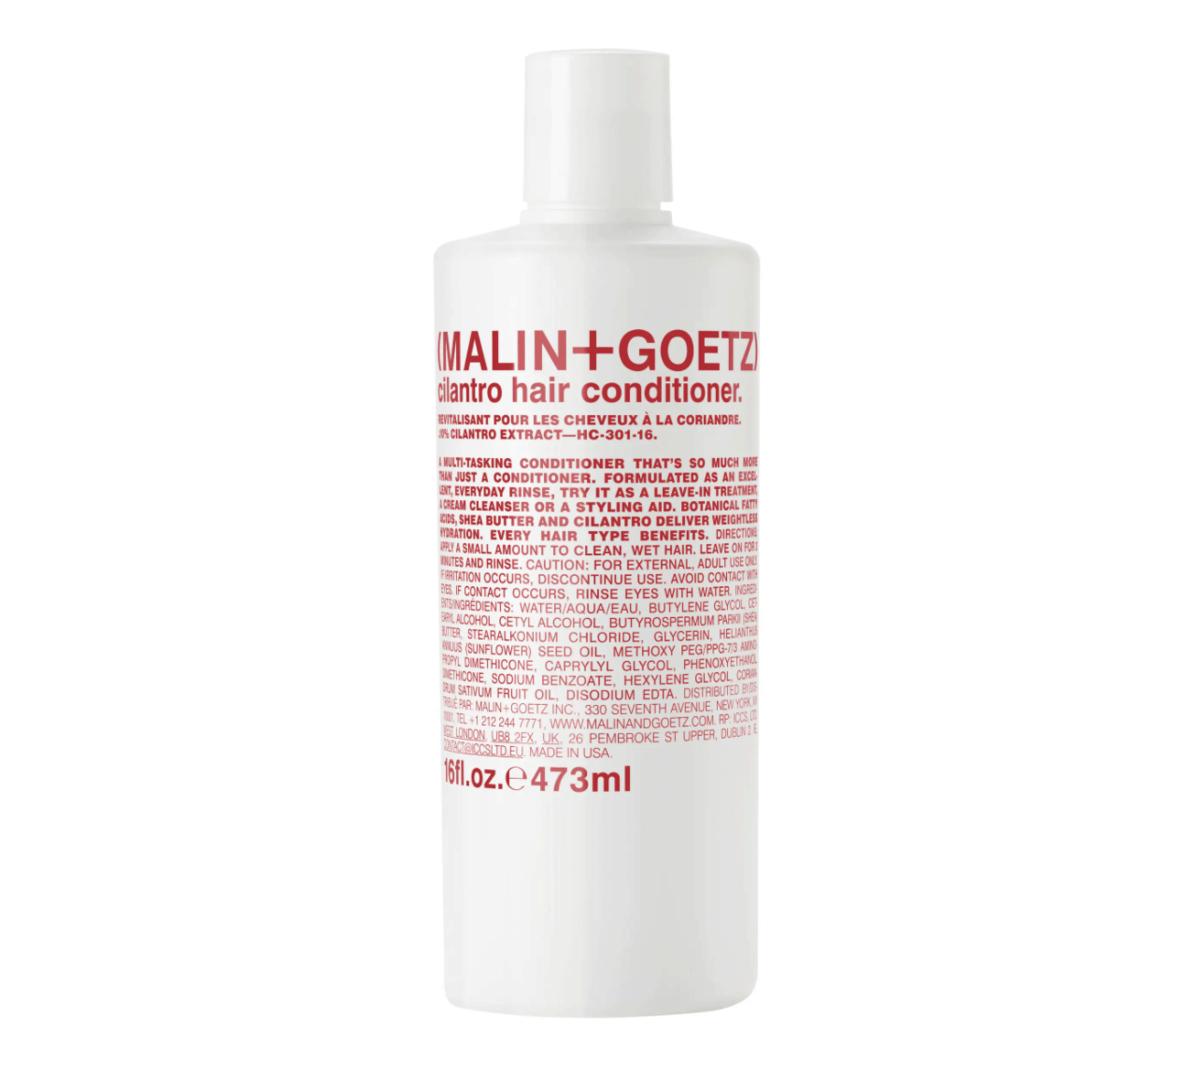 malin-goetz-hair-conditioner